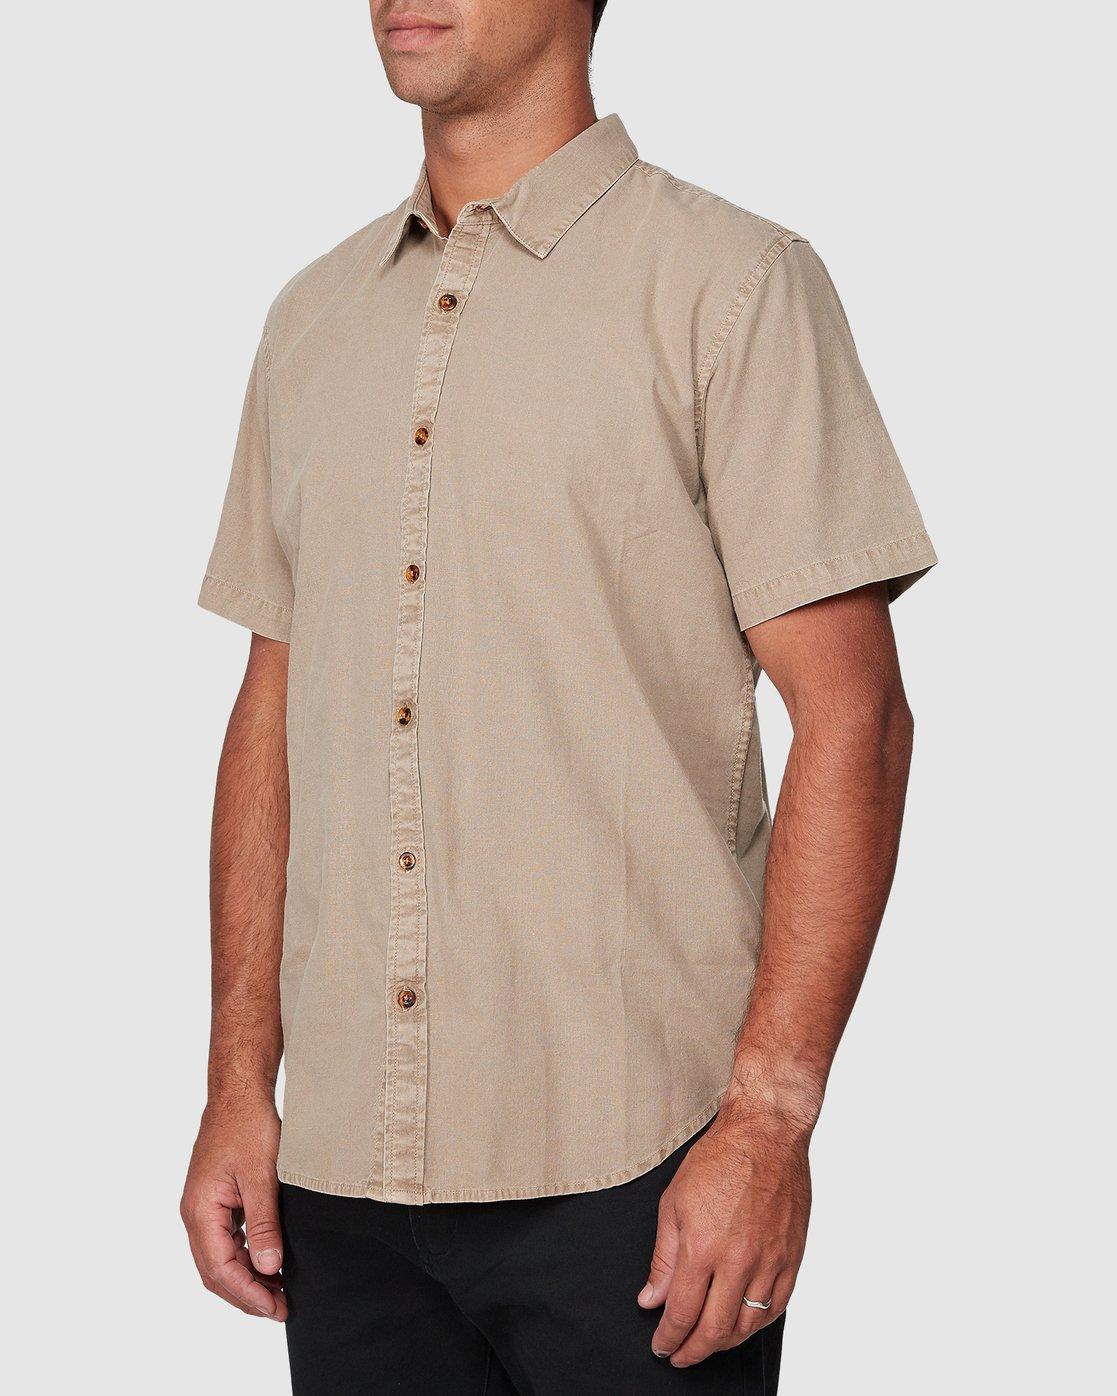 2 Crushed Short Sleeve Shirt Brown R182191 RVCA